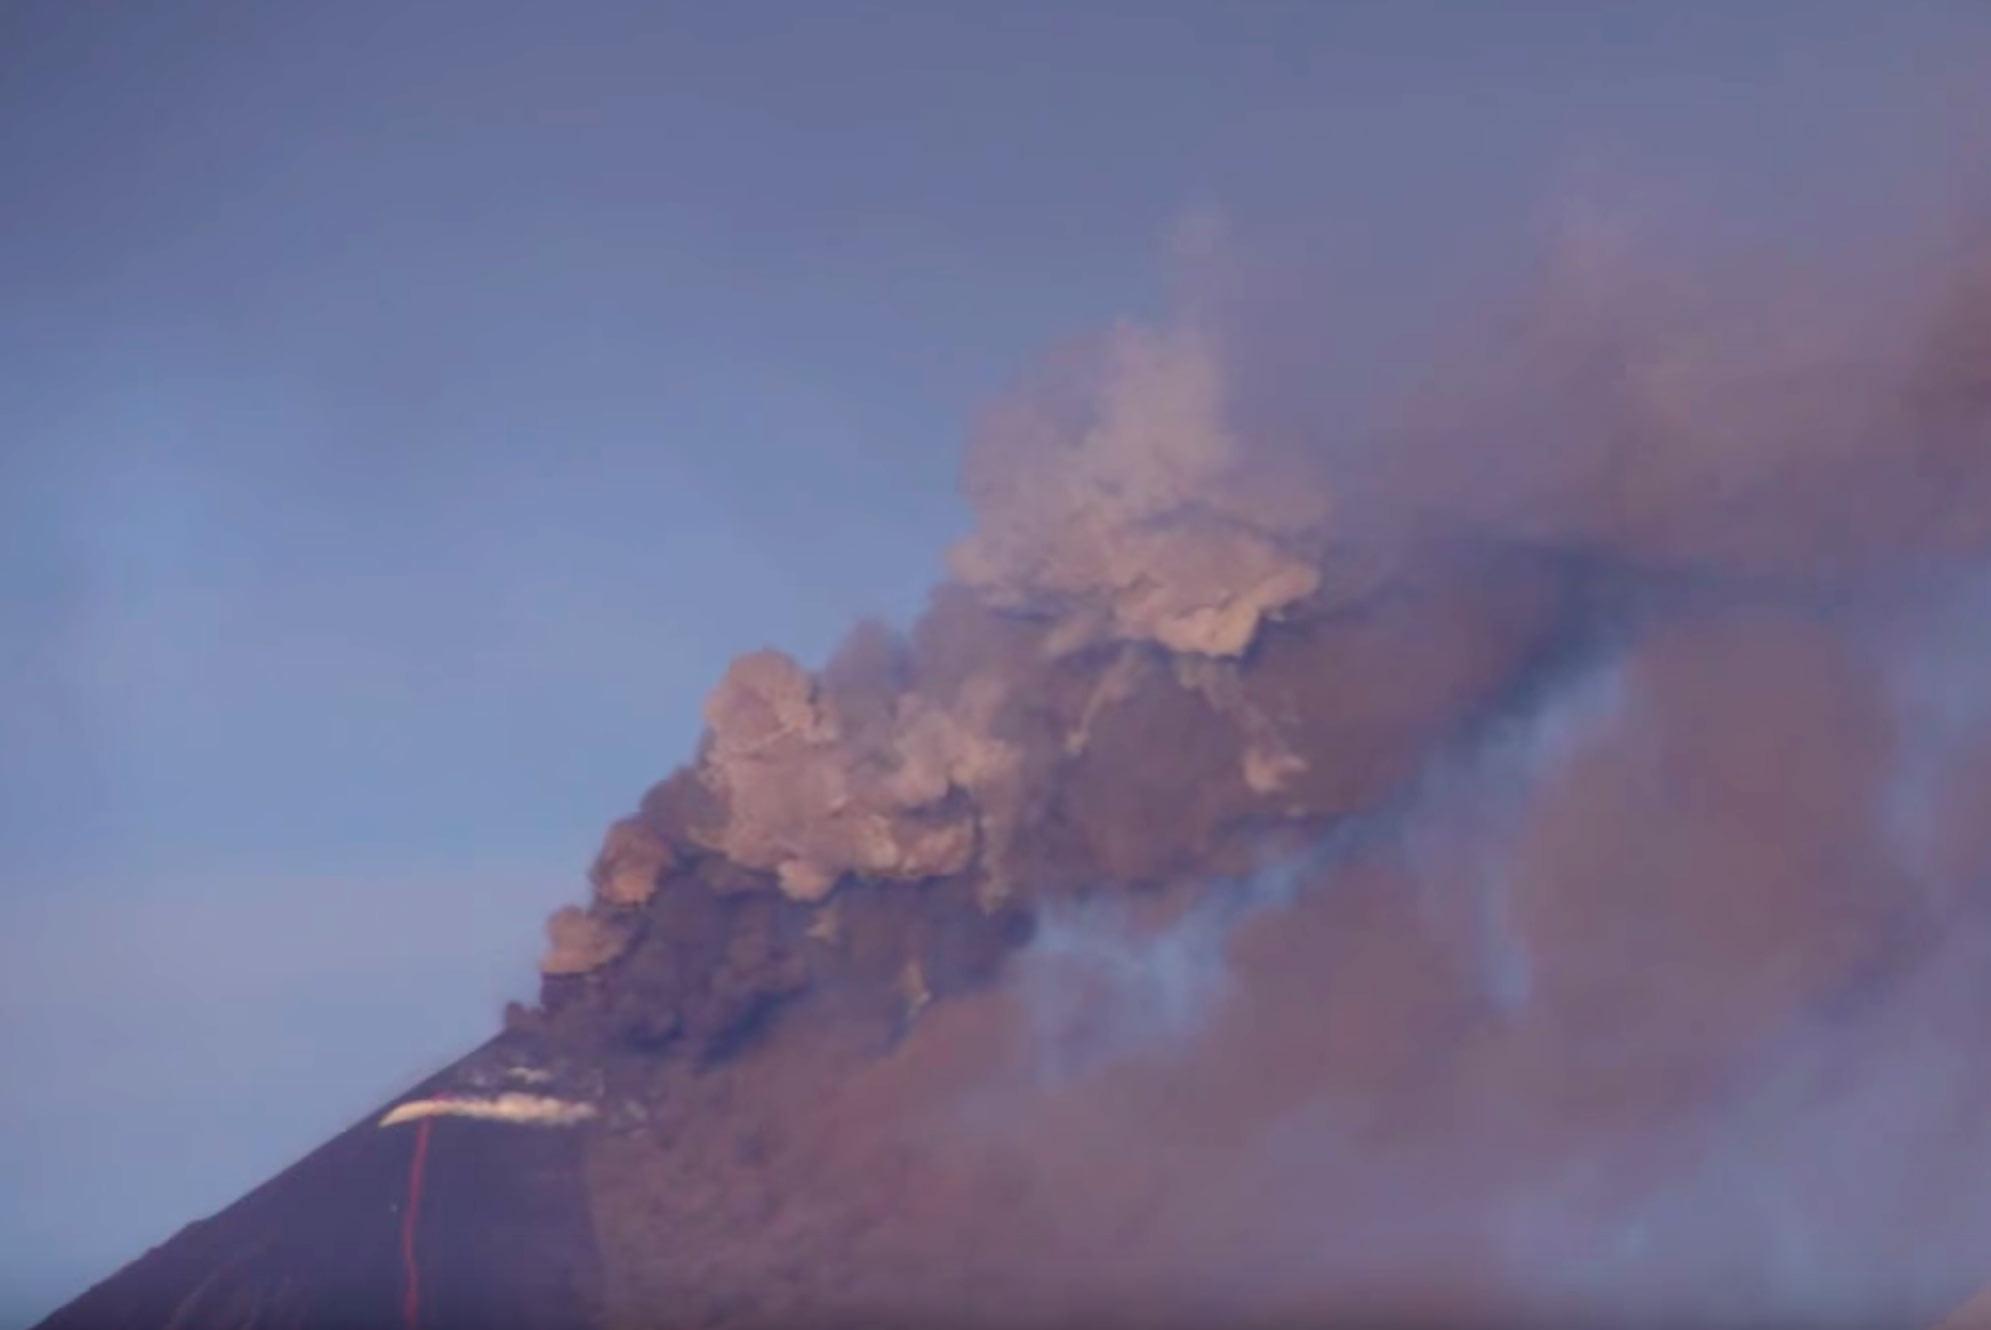 "<p>Кадр видео&nbsp;<a href=""https://www.youtube.com/watch?v=dXZGcb1Jgqo"" target=""_blank"">Eruption of Klyuchevskoy (Ключевской) in Kamchatka</a>. Скриншот &copy; L!FE</p>"